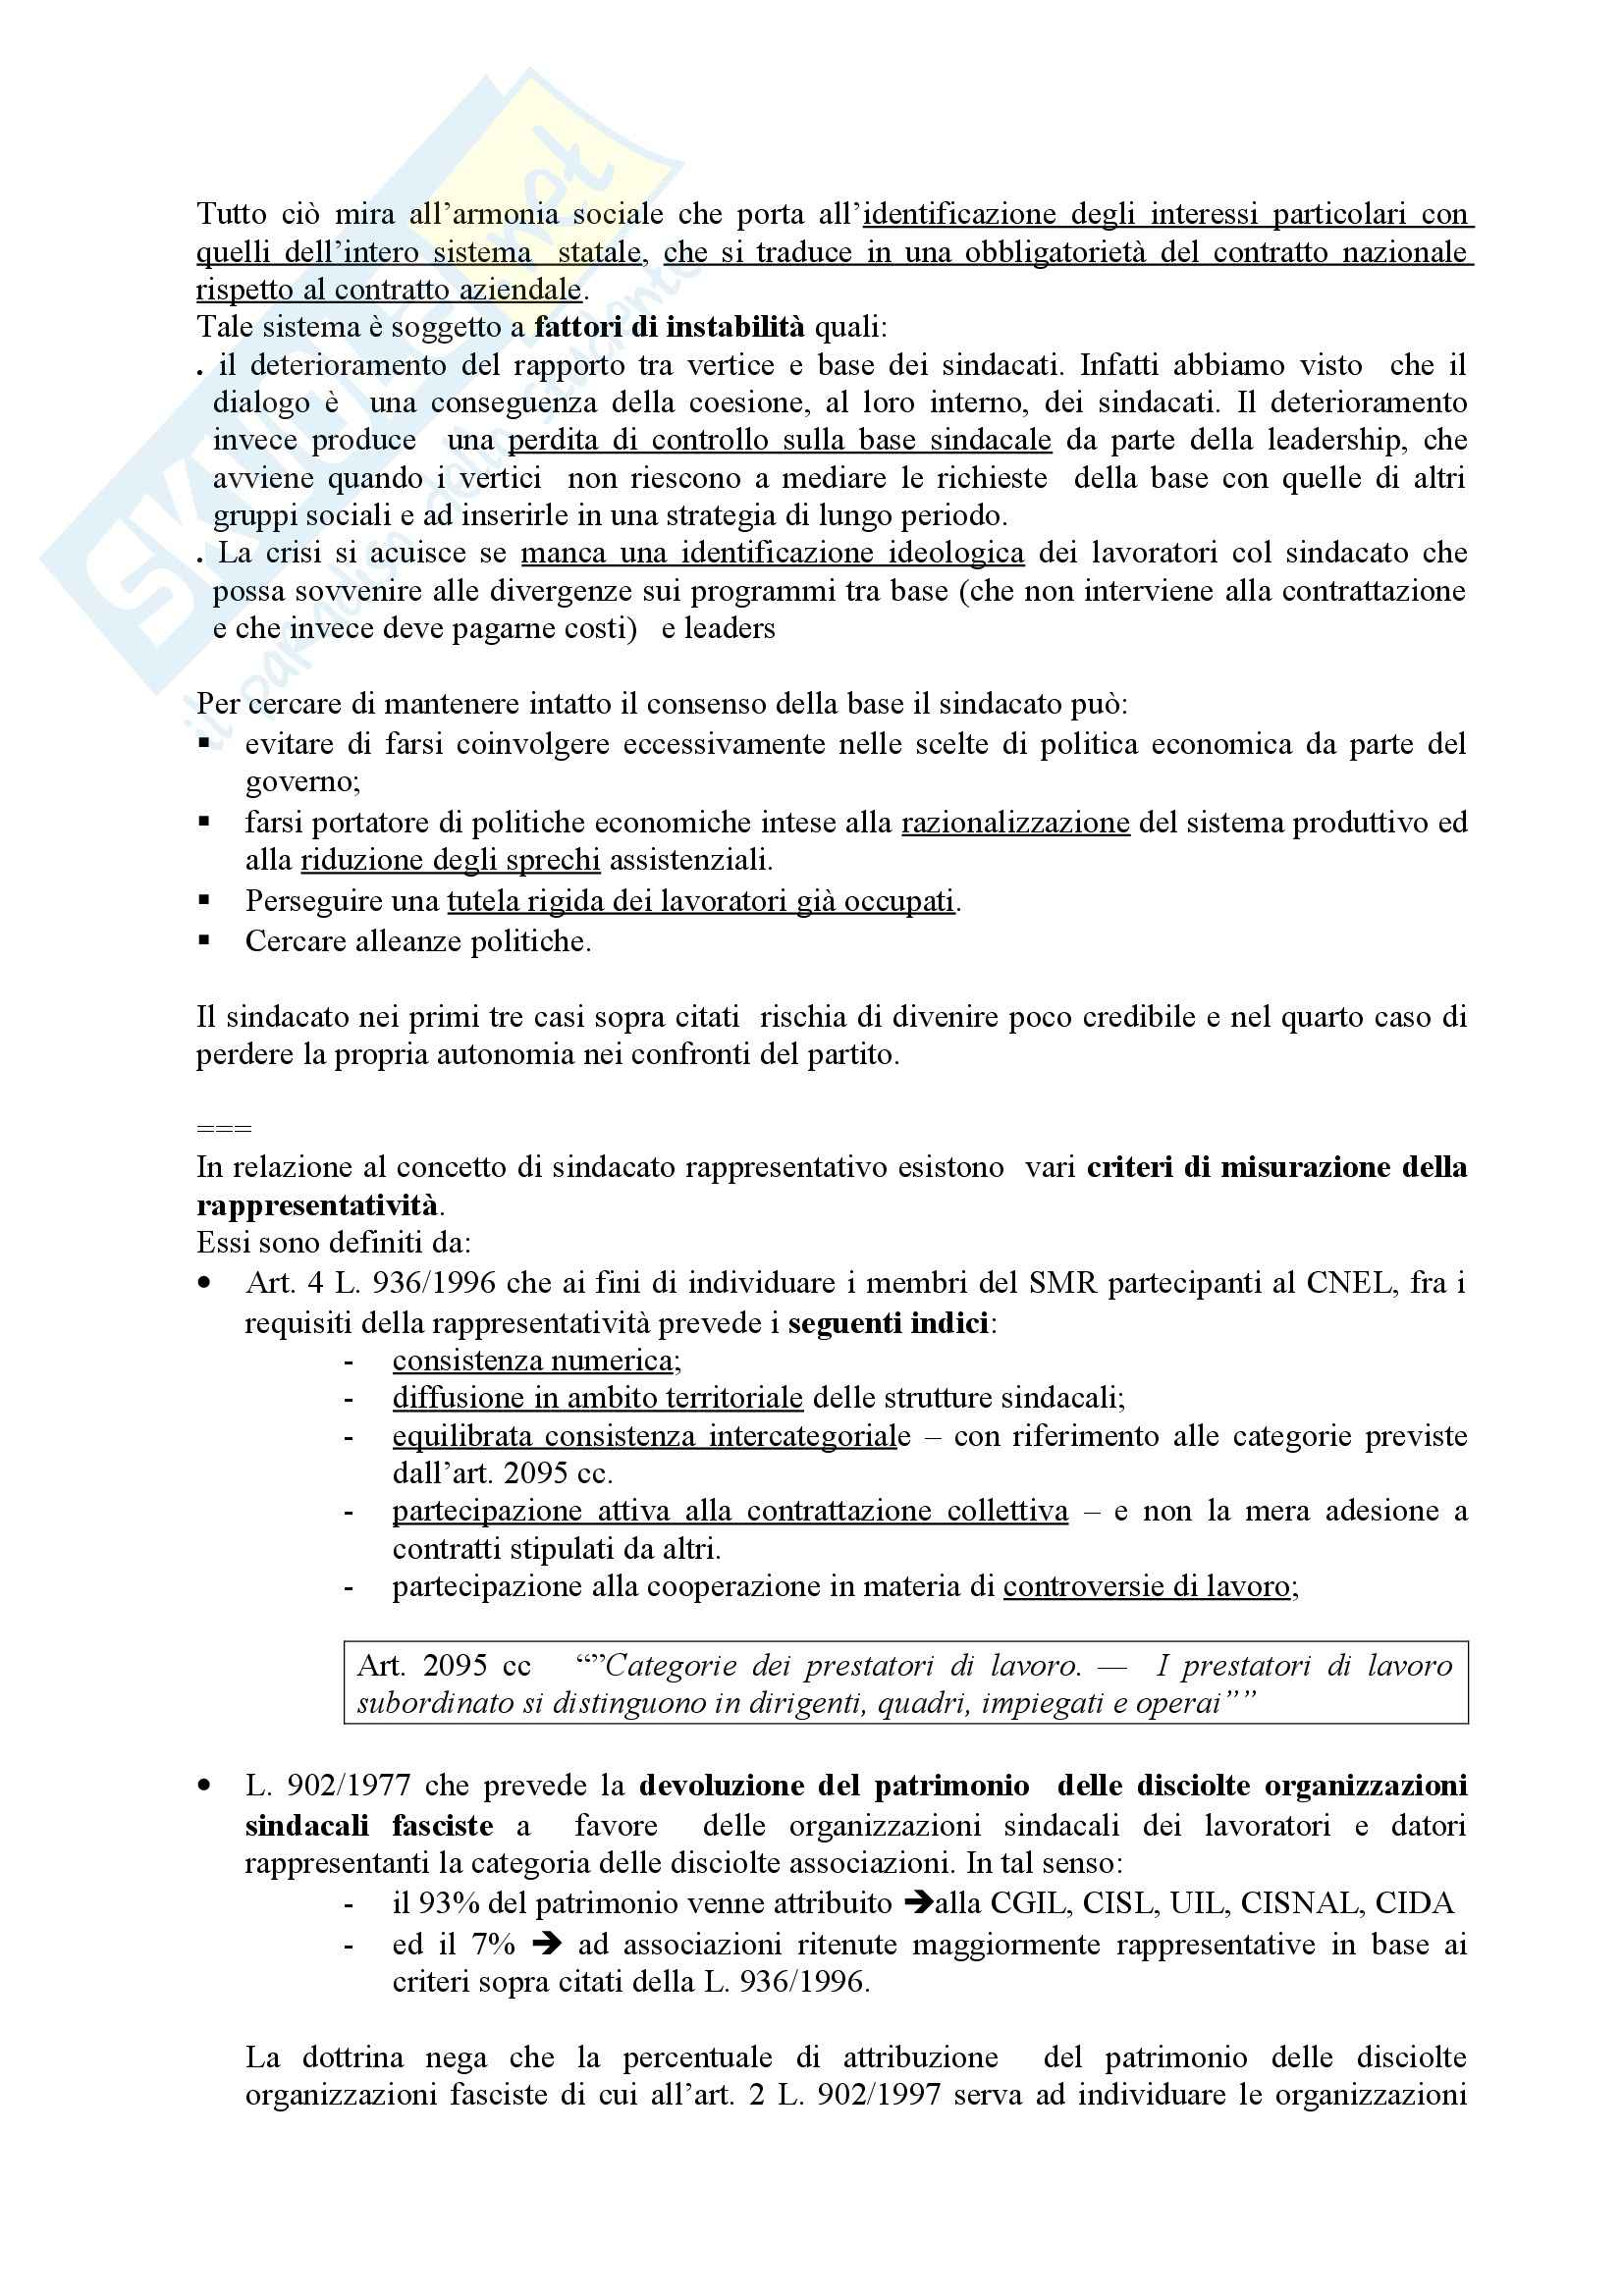 Diritto sindacale - l'organizzazione sindacale Pag. 16